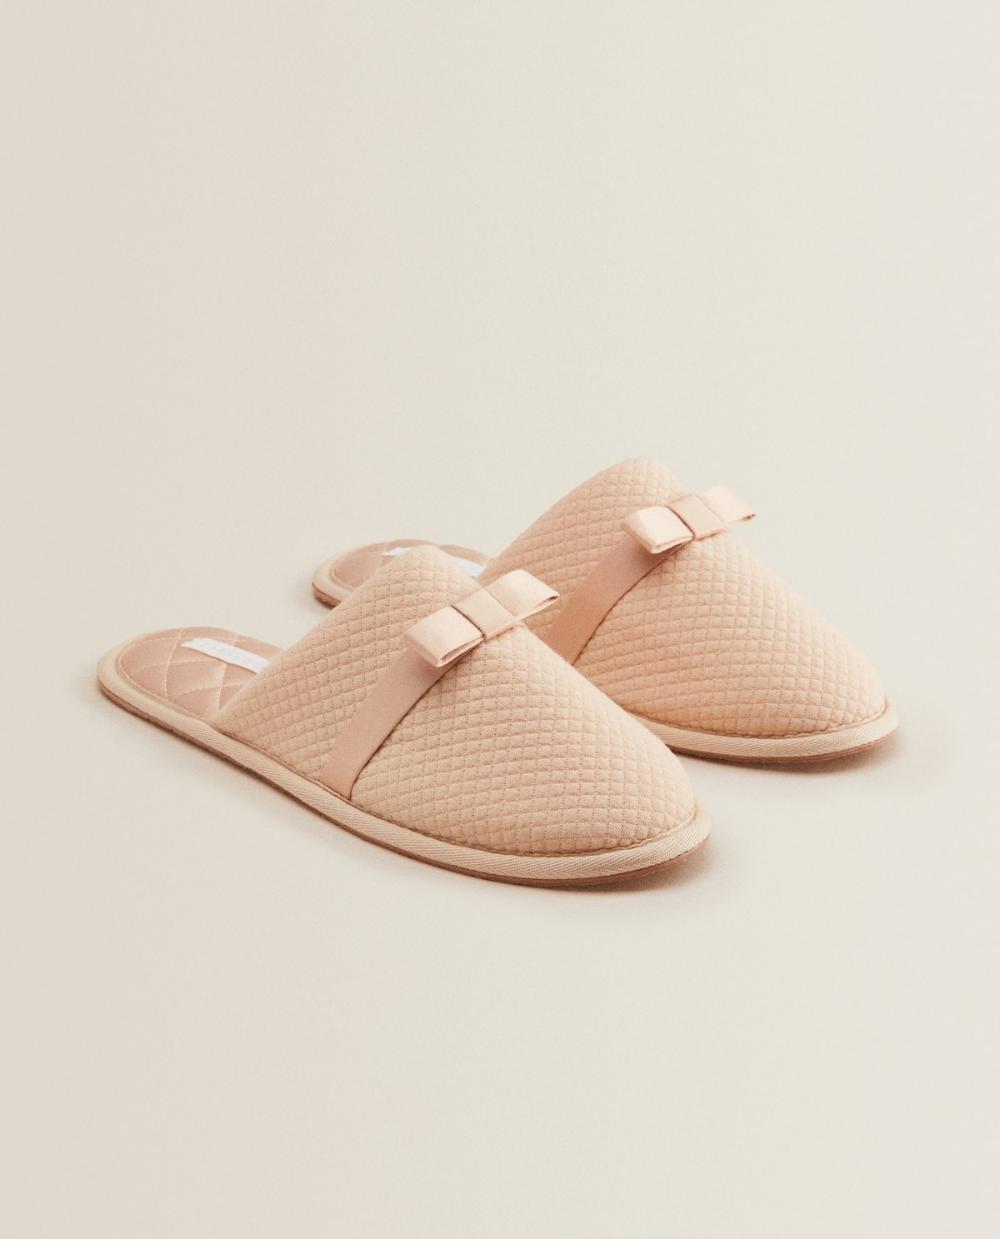 Zdjecie Nr 1 Produktu Pantofle Z Kokarda Pantufas Estilo Pessoal Sapatos